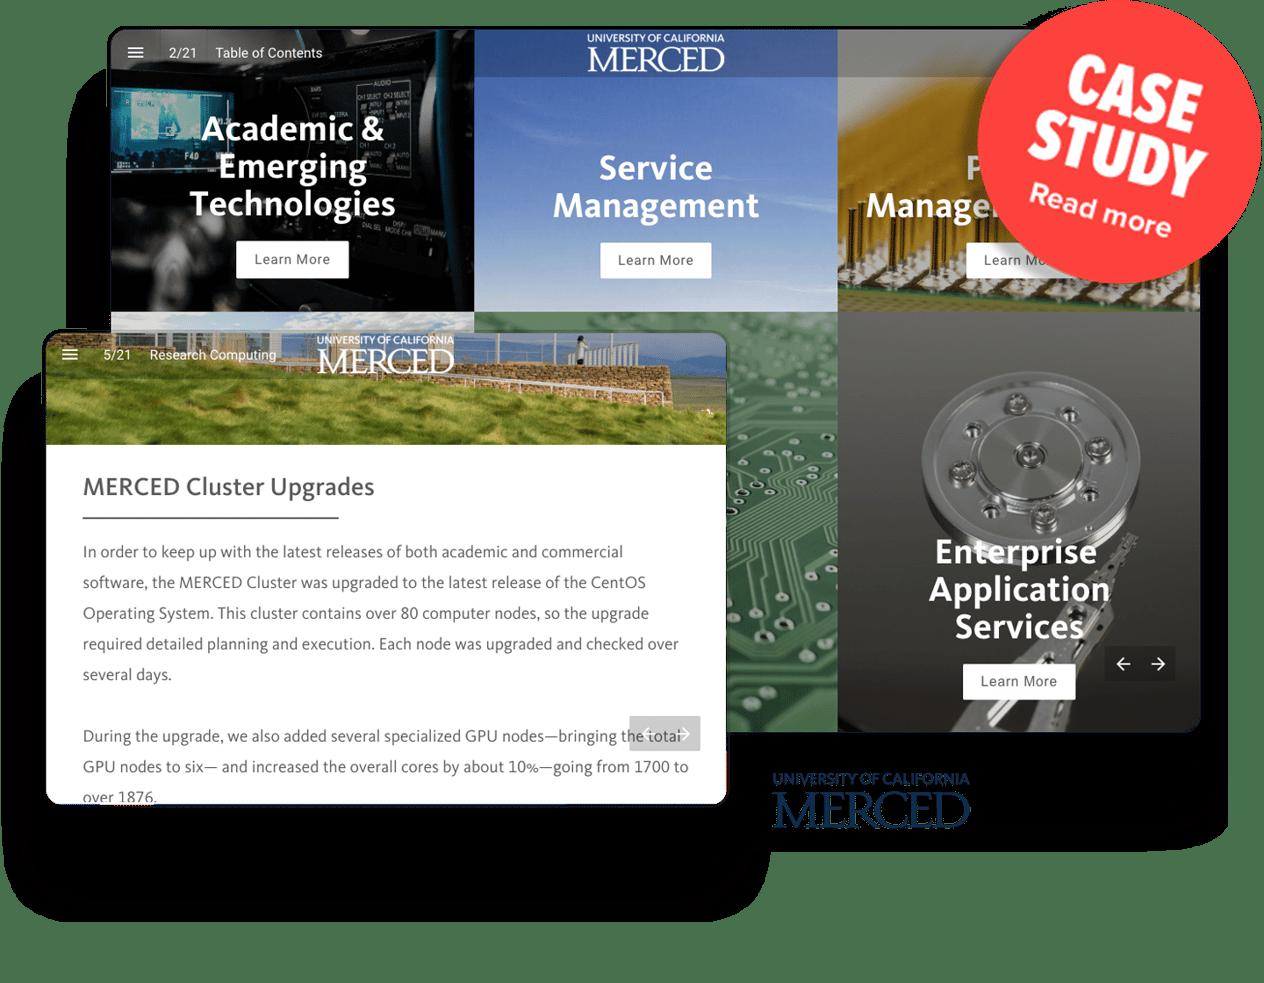 interactive-report-successstory-uc-merced